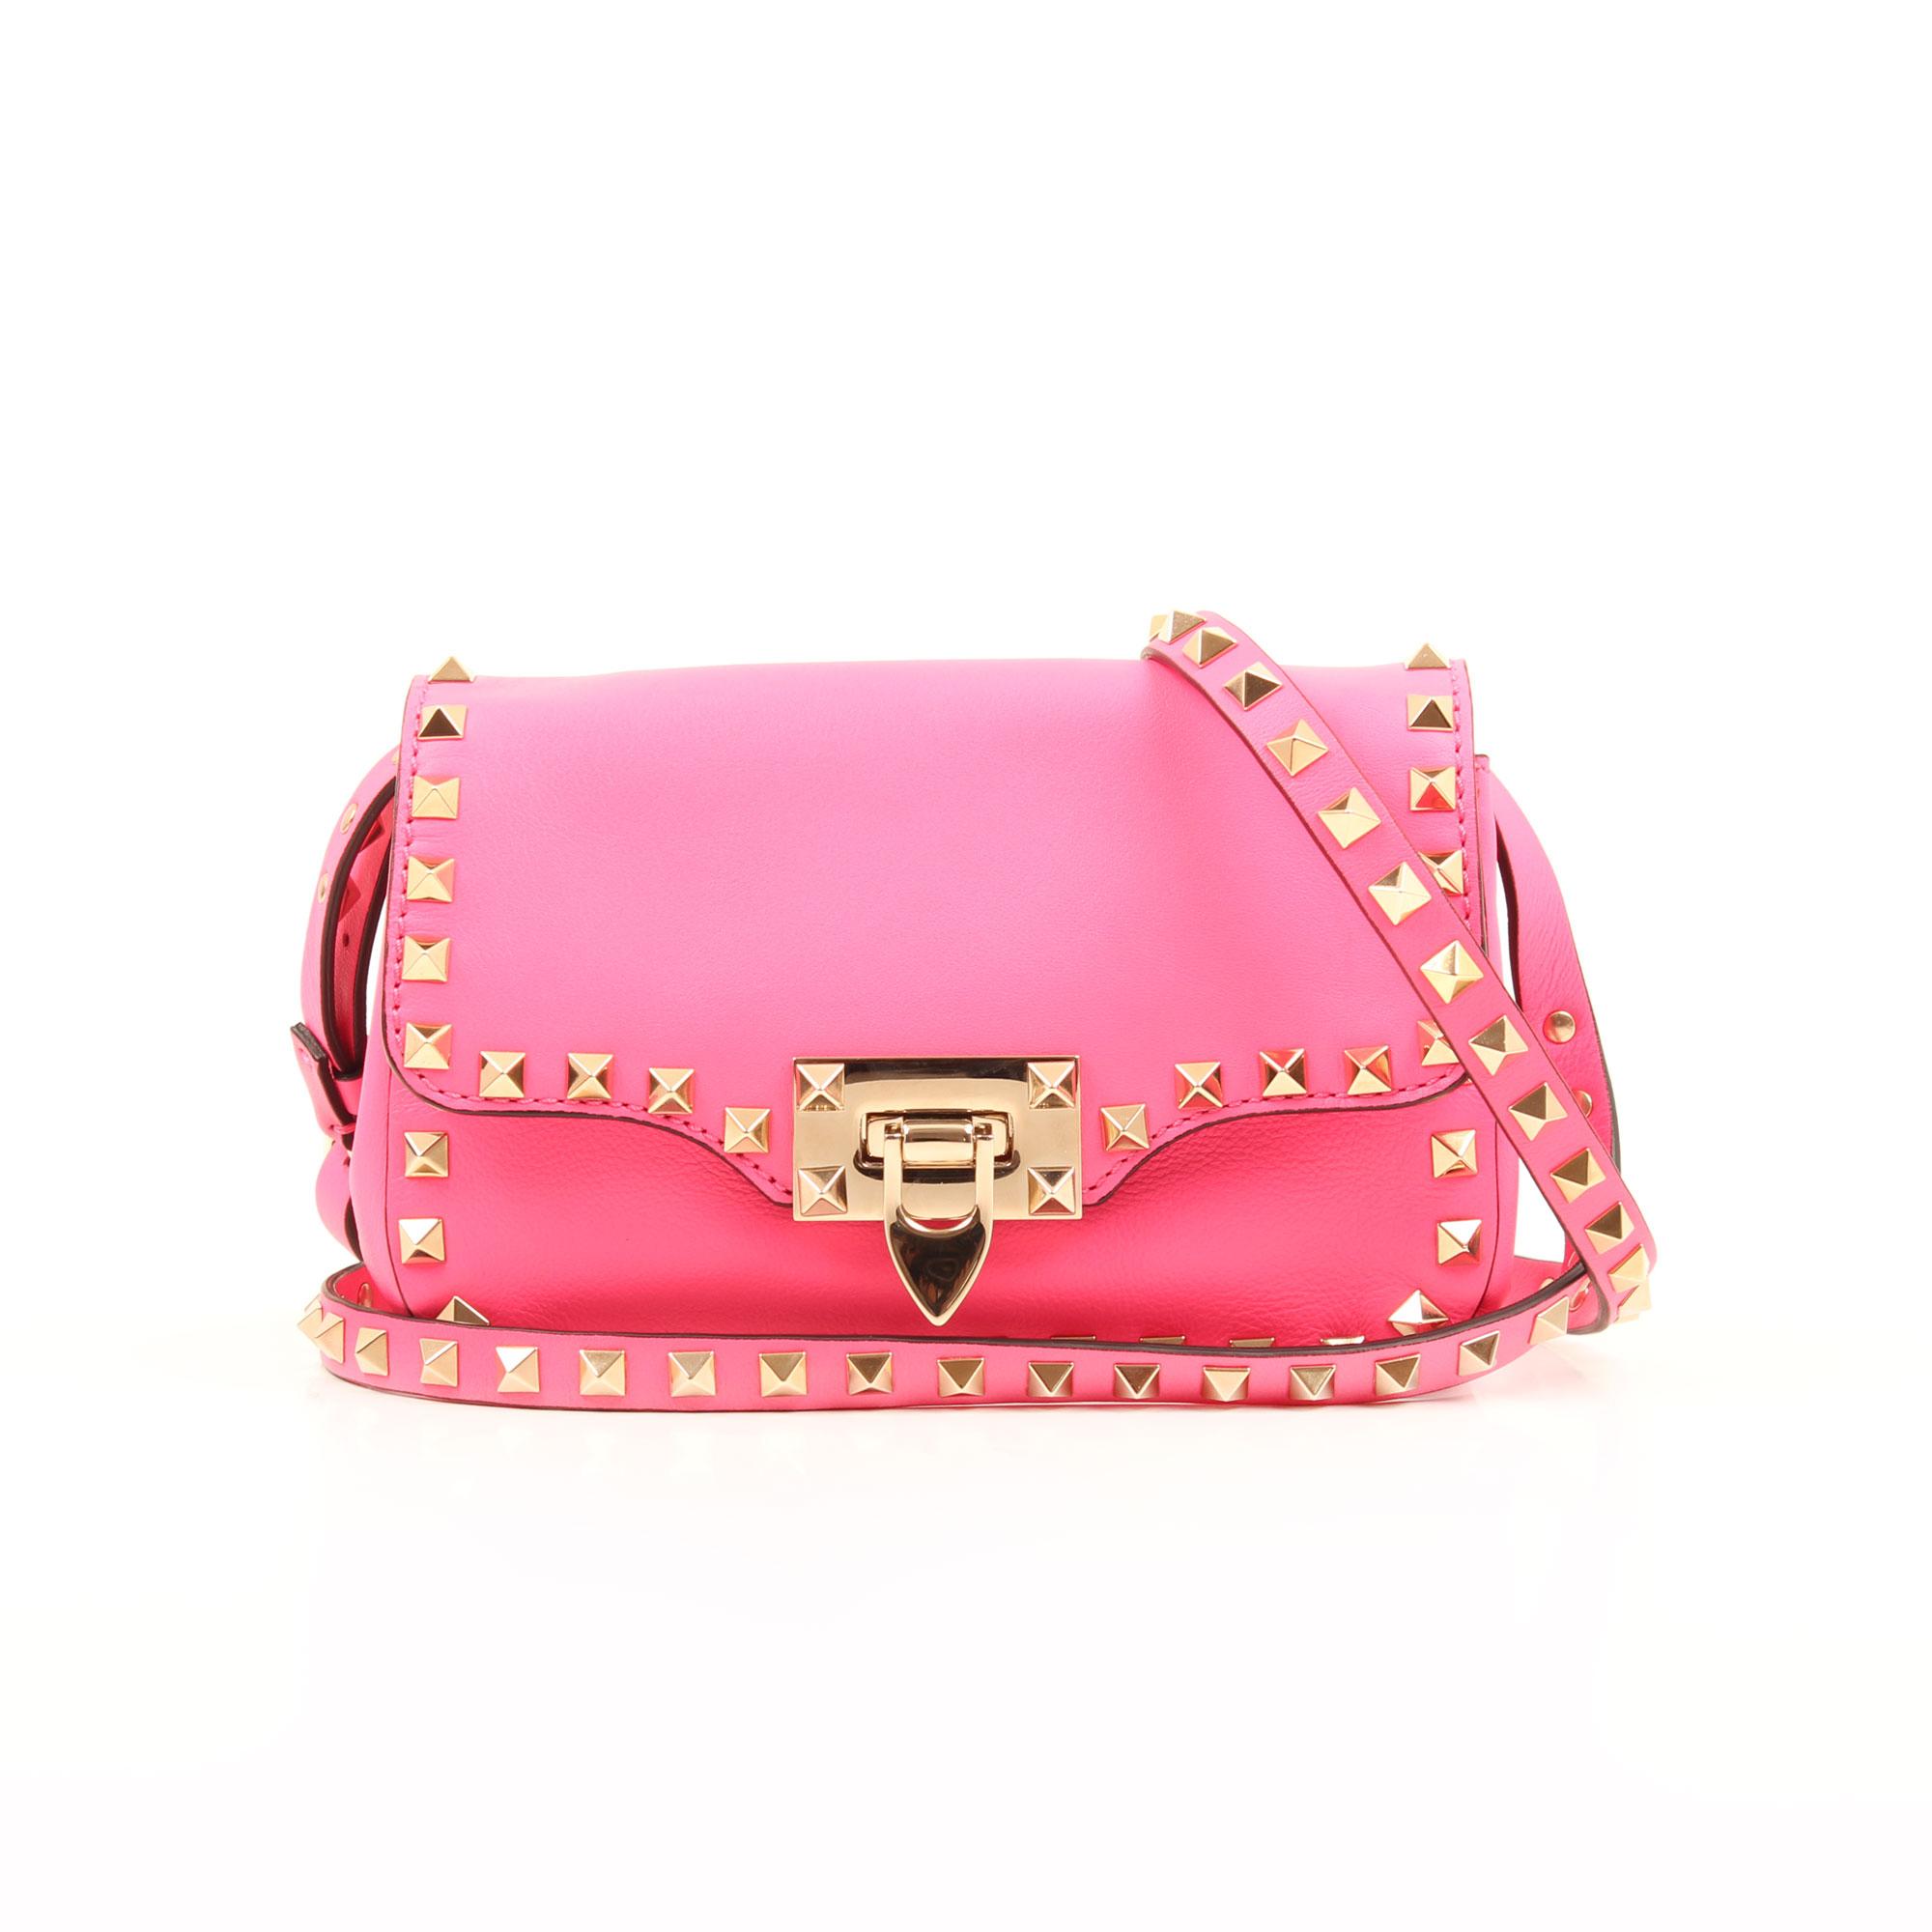 Front image of valentino mini rockstud pink bag